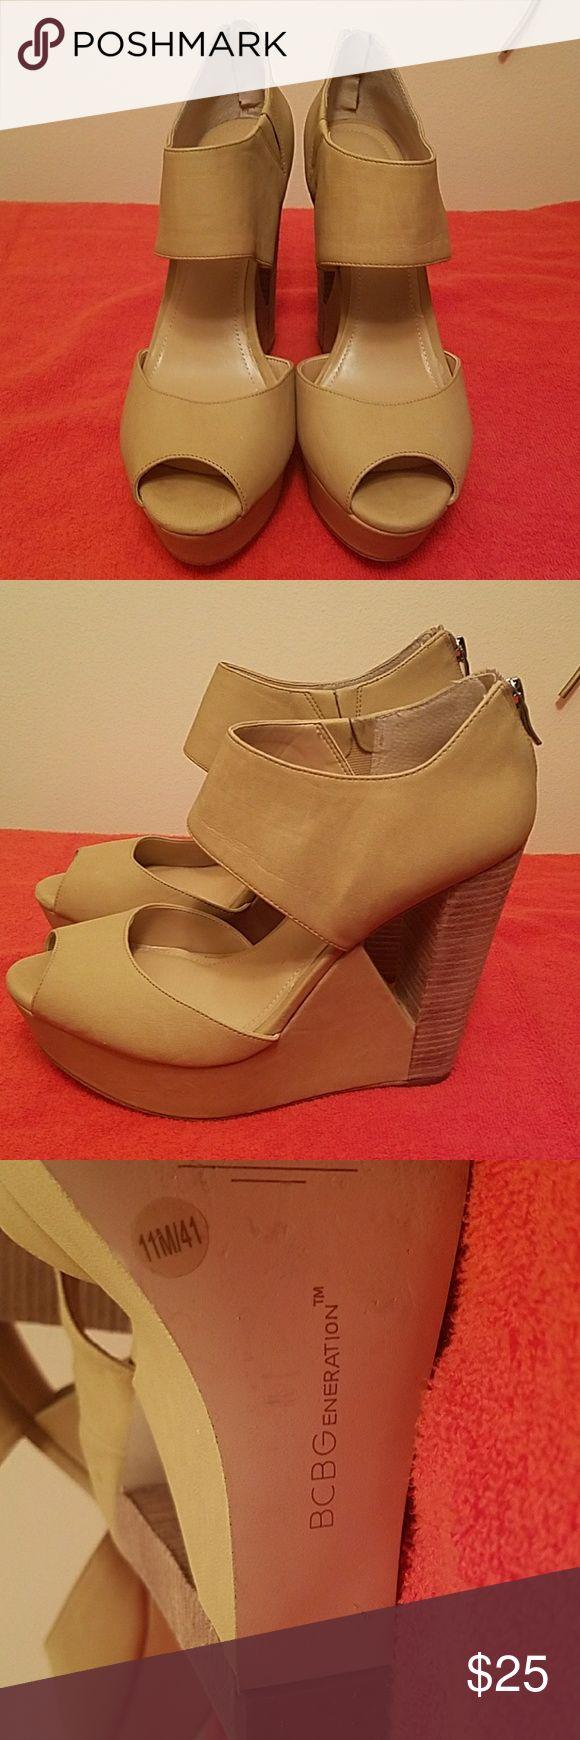 BCBG Generation Velara Platform Wedge Shoes Size 11...Great Condition BCBGMaxAzria Shoes Wedges